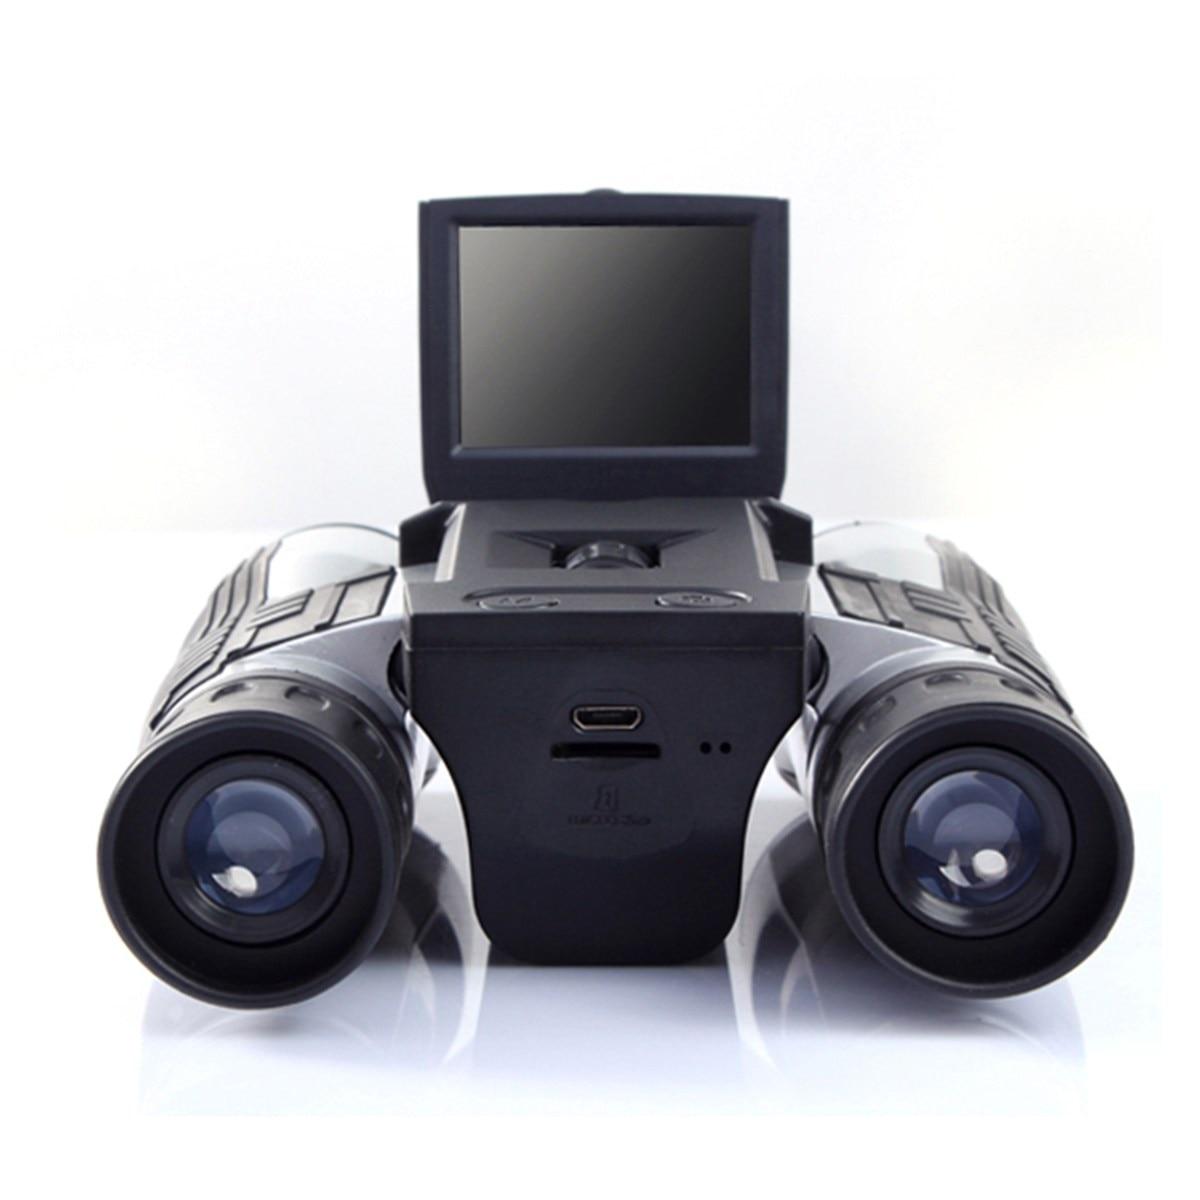 12x32 1920X1080 p Full HD Video Kamera Teleskop Fernglas Mit 2 inch Bildschirm Outdoor camping vogel beobachtung jagd wandern